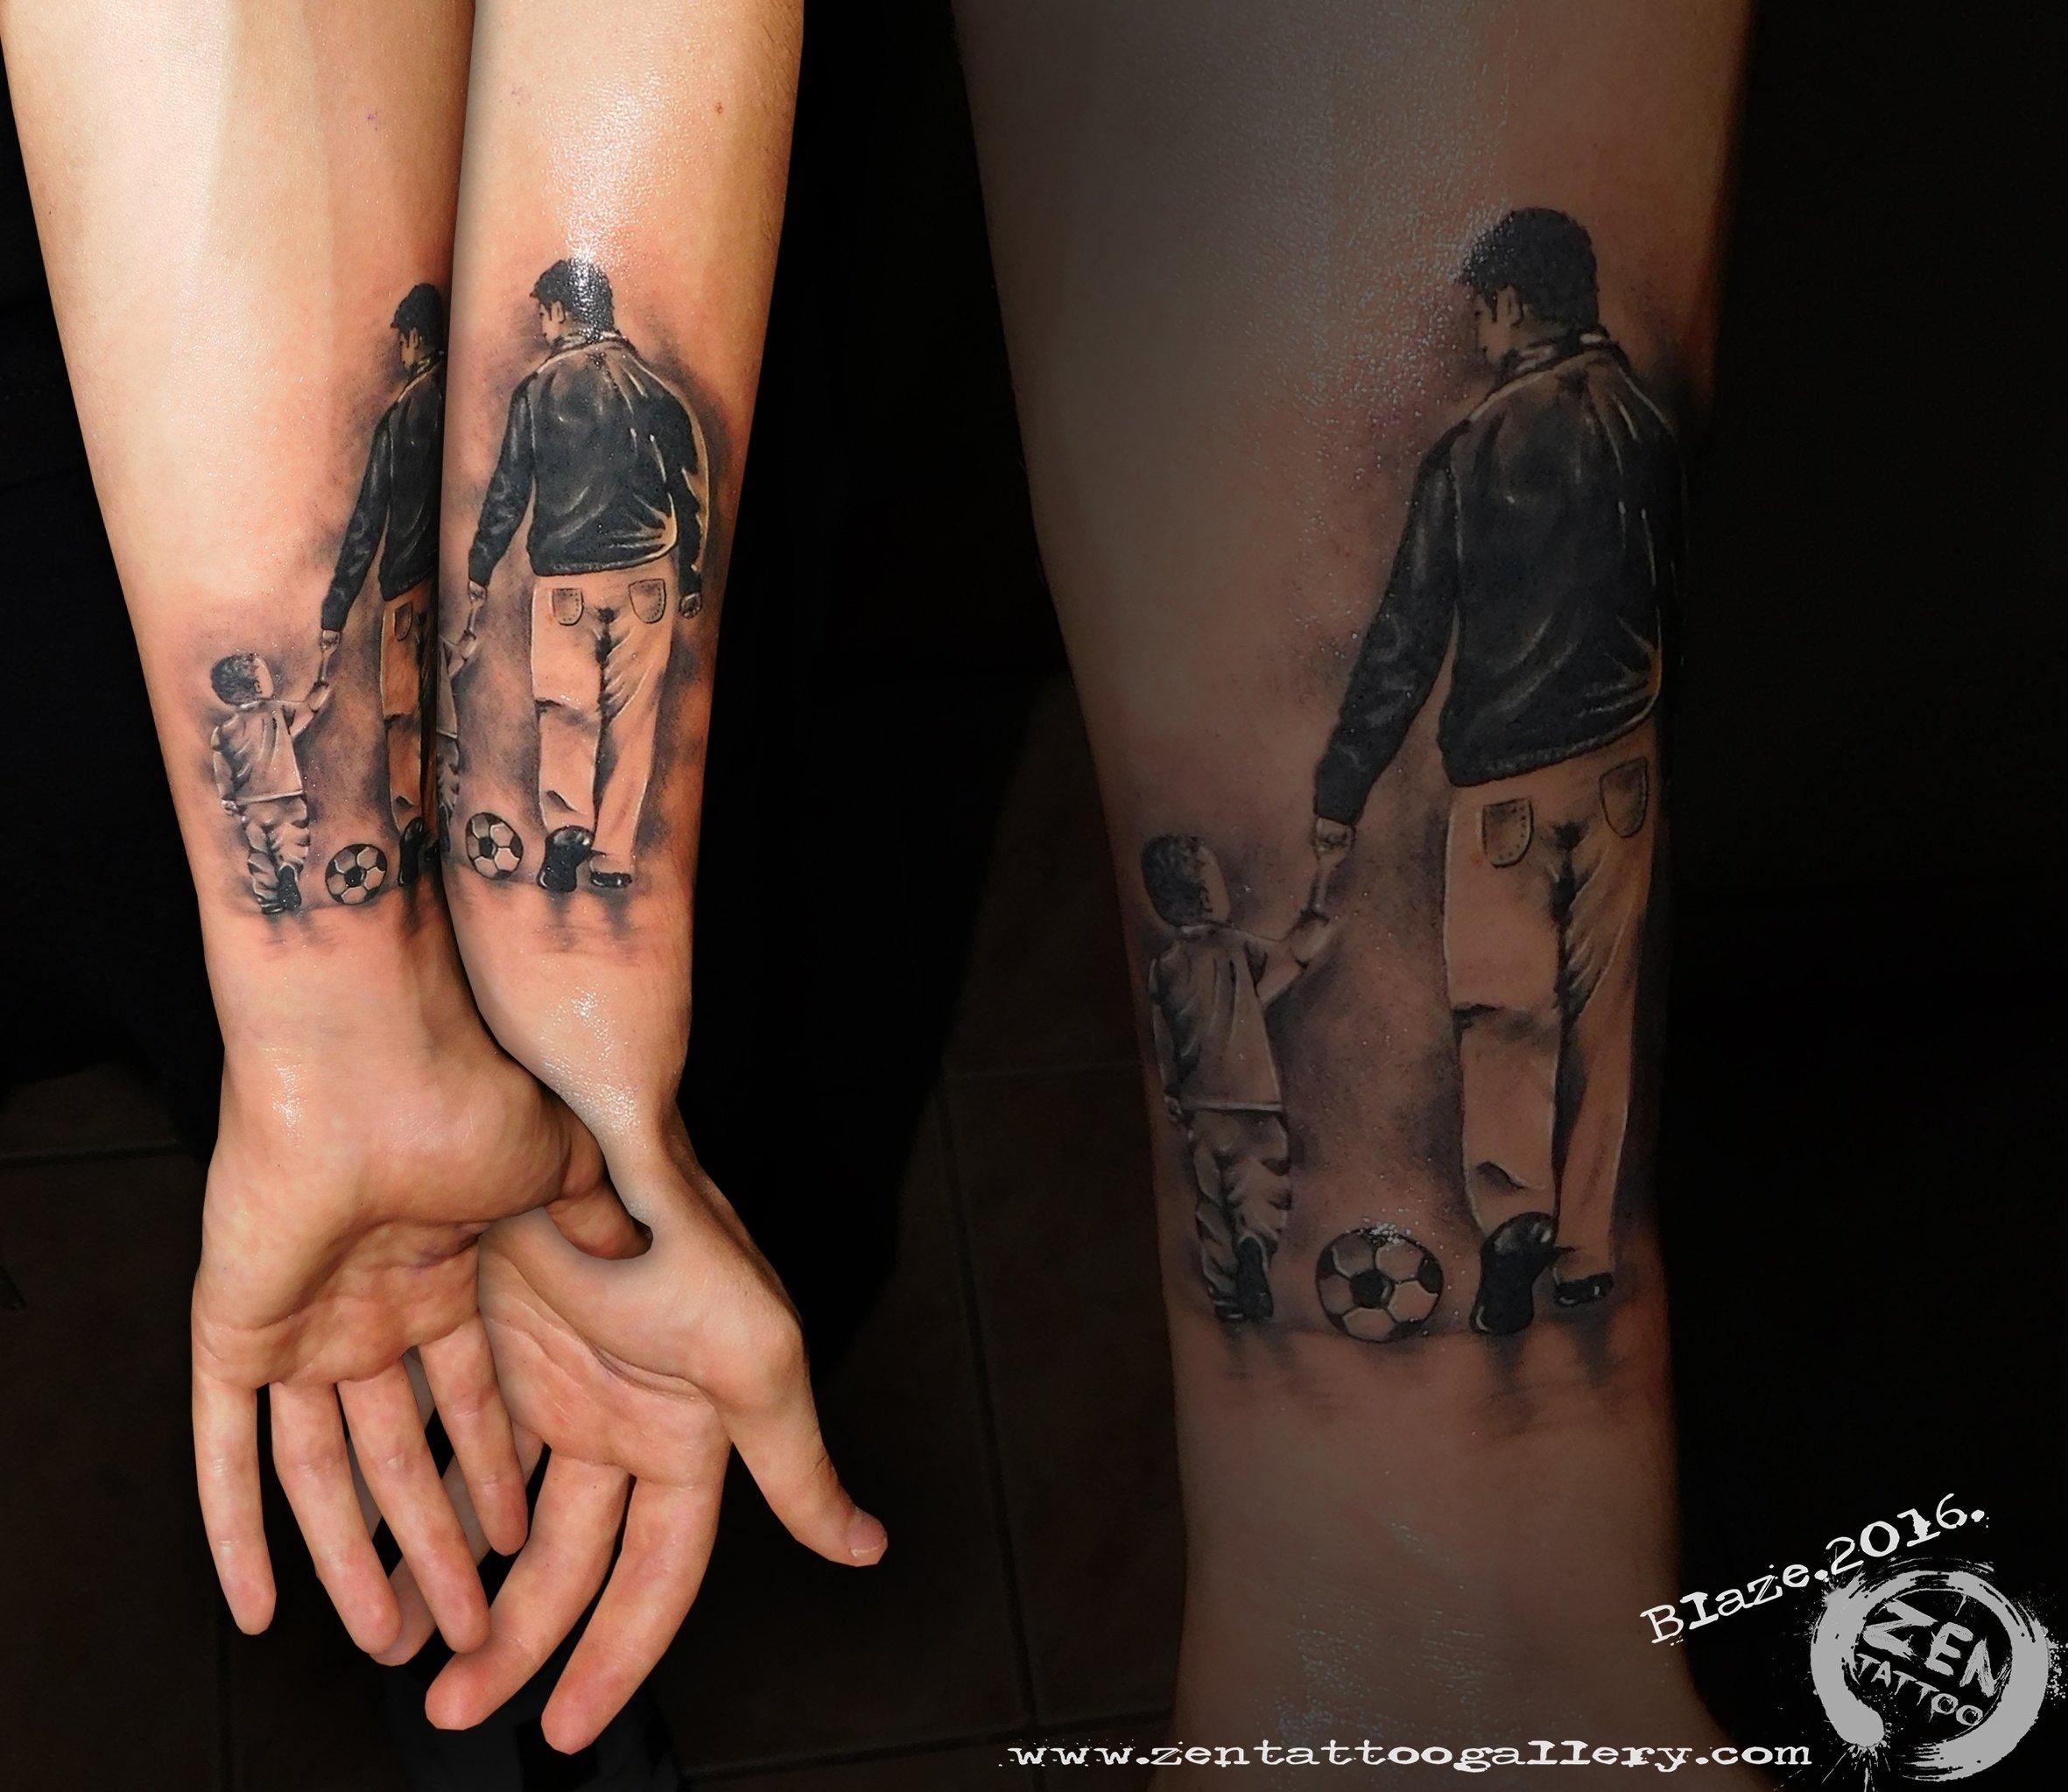 10 Best Son Tattoo Ideas For Dad father and son tattooblaze www facebook zentattoozagreb www